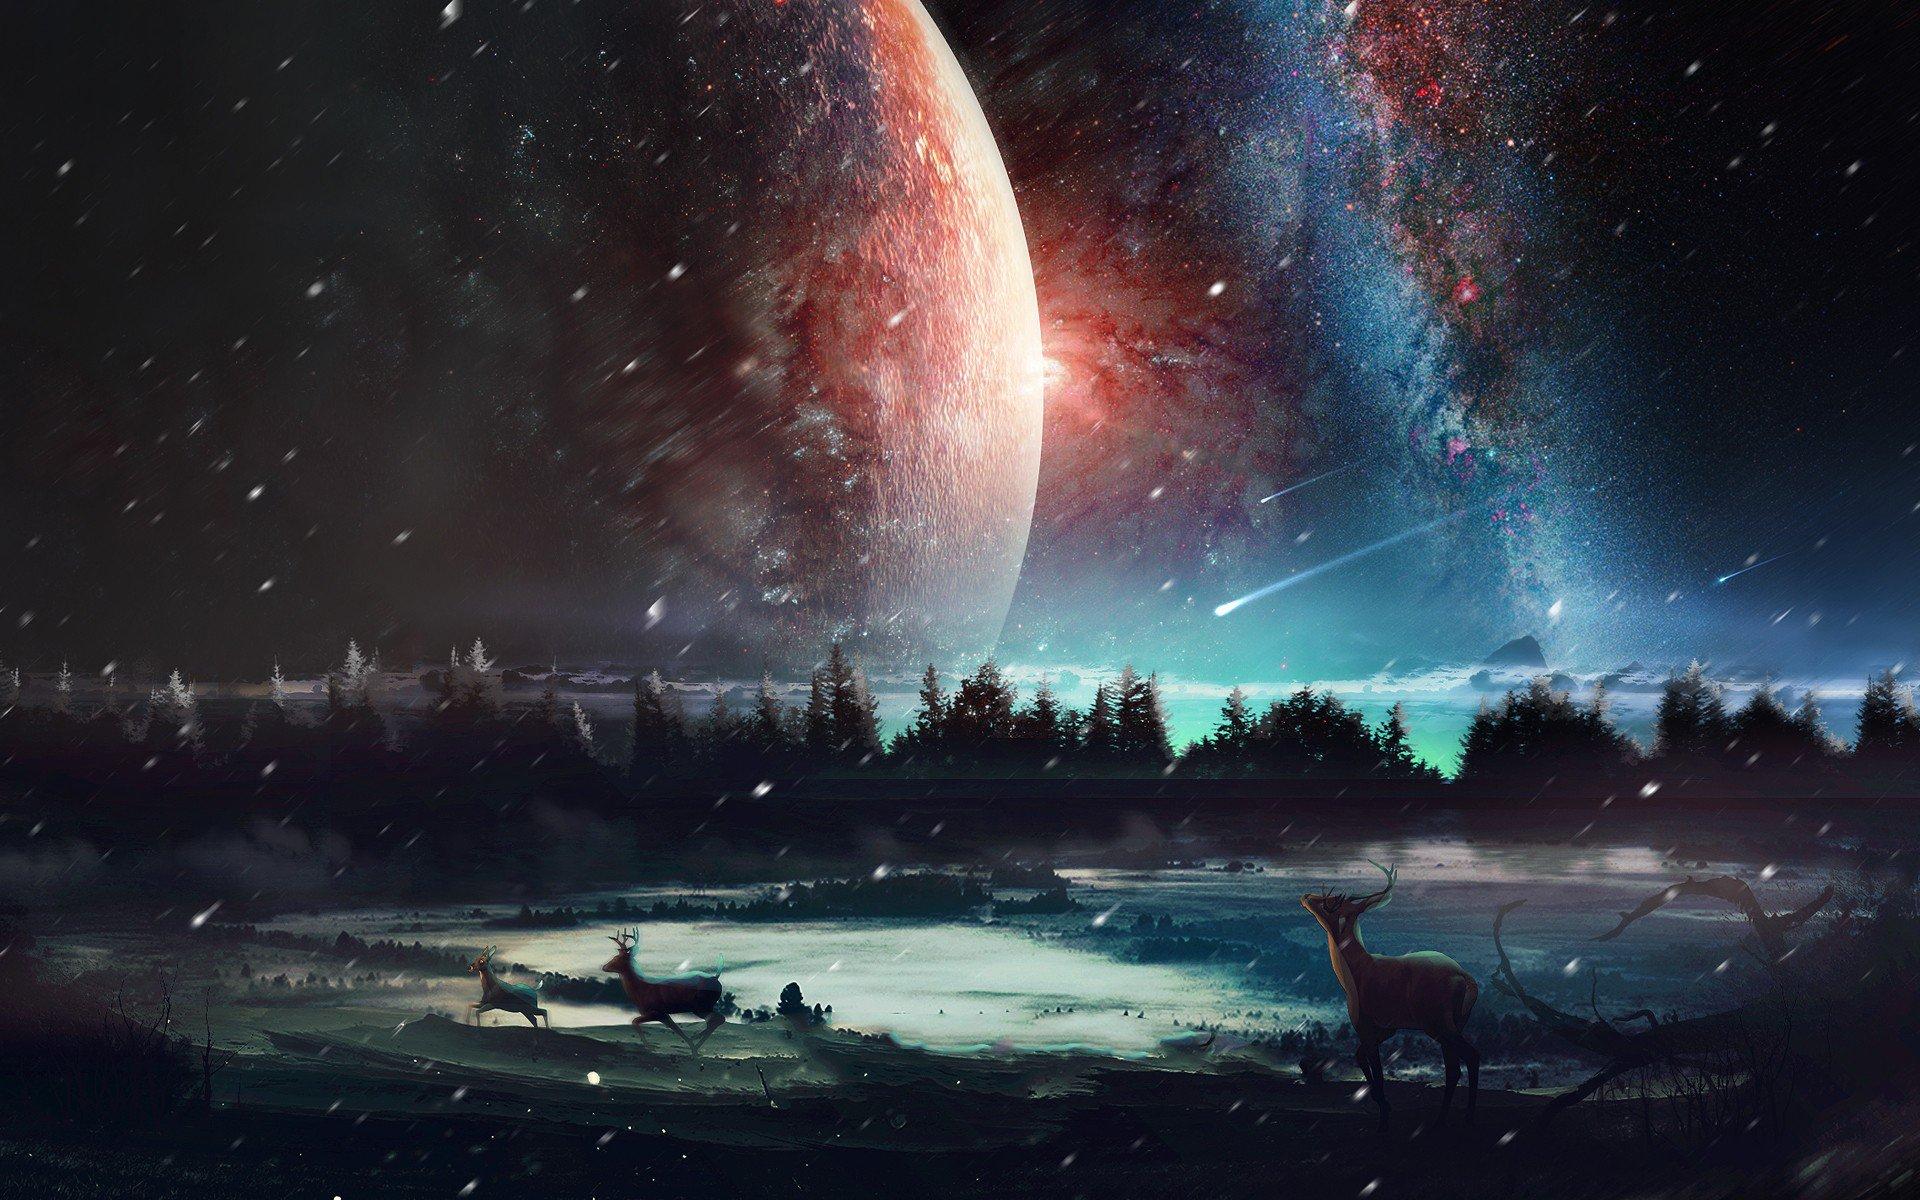 universe desktop wallpaper 4k-#42